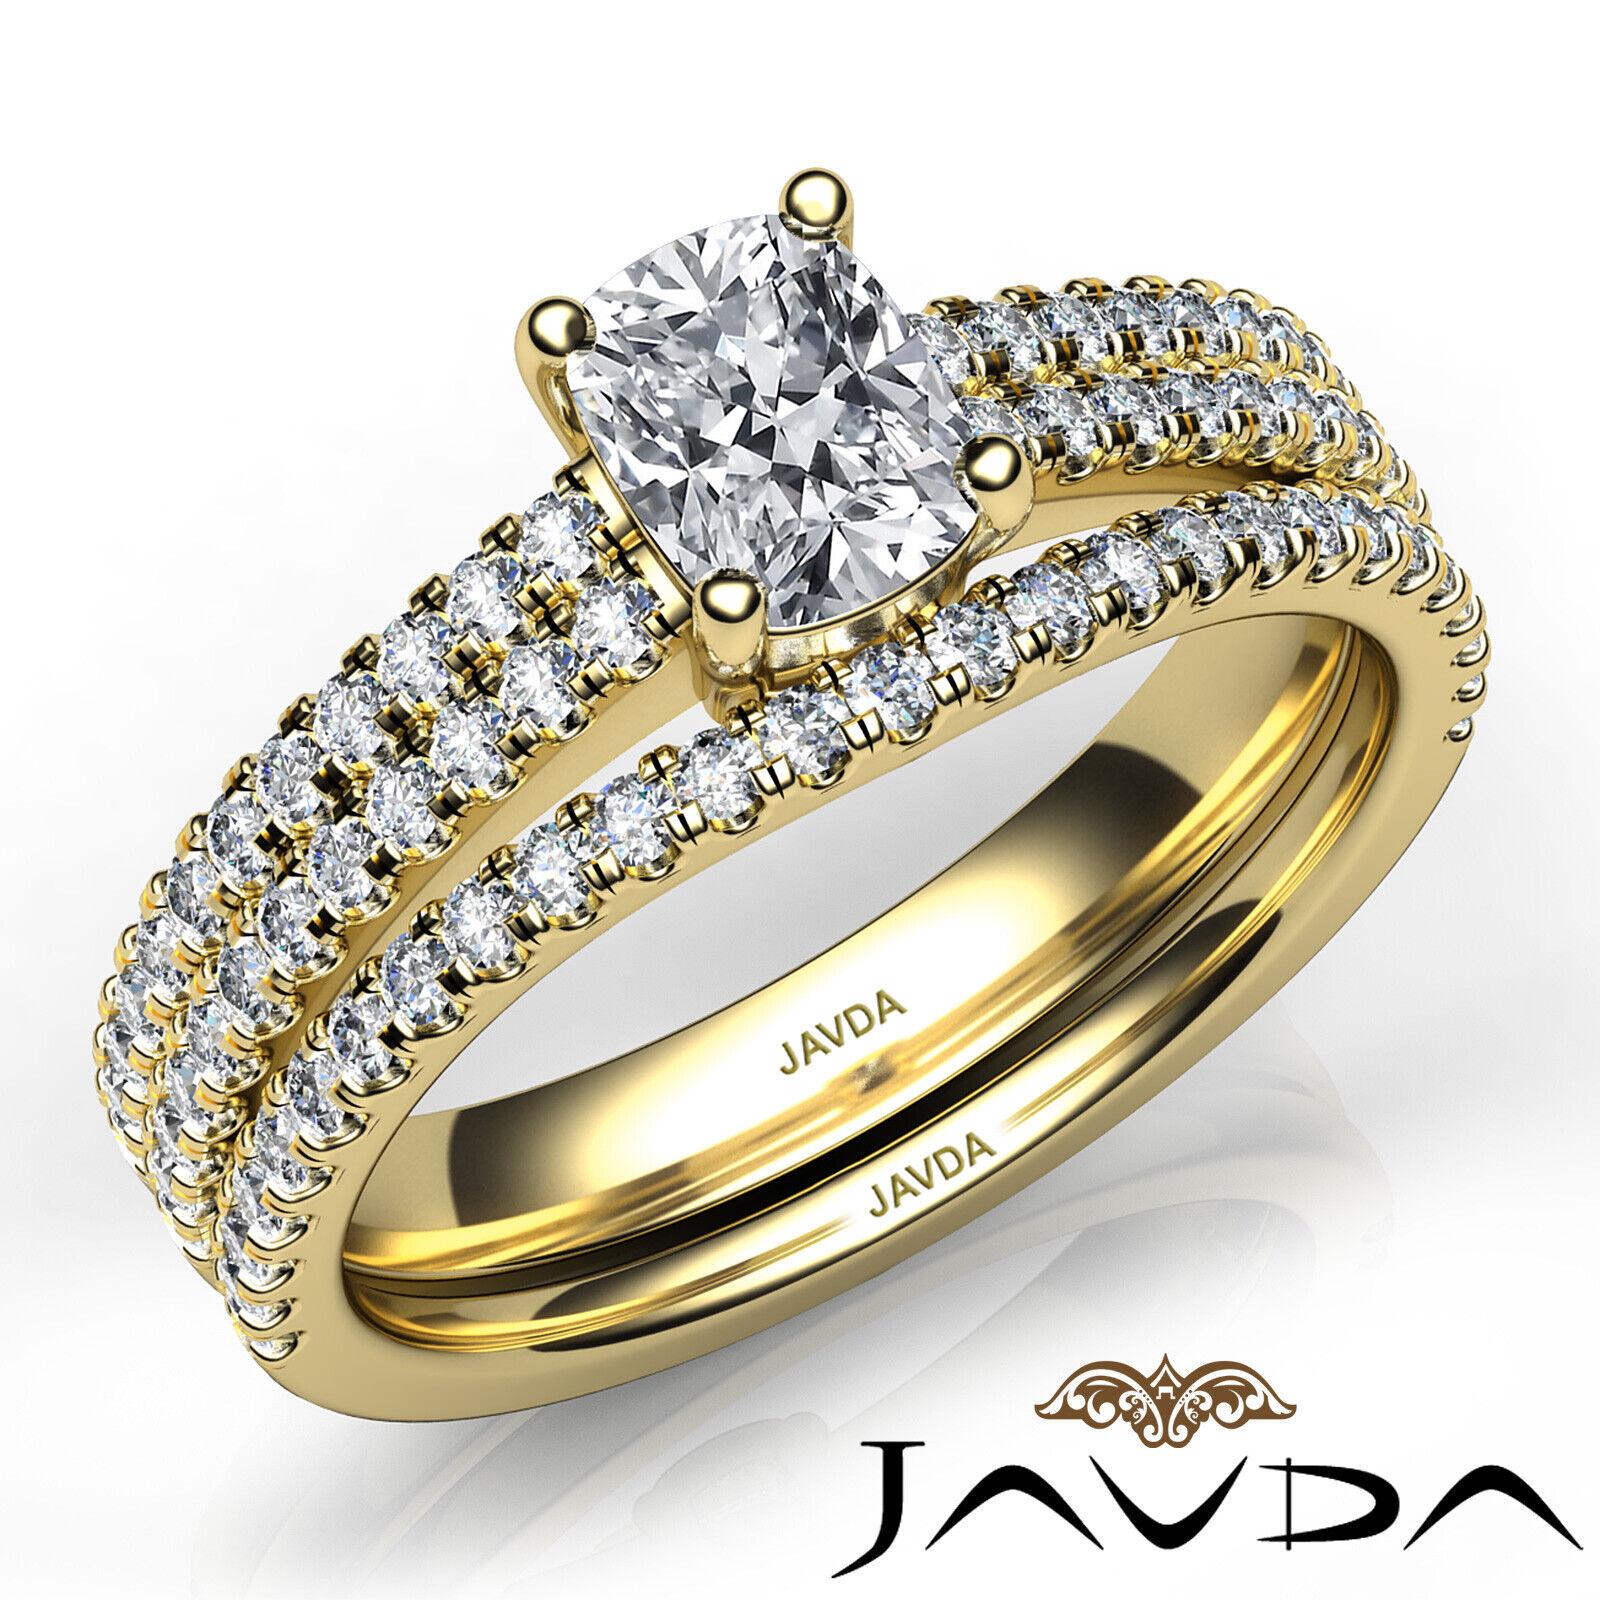 1.8ctw Bridal Scalloped Pave Cushion Diamond Engagement Ring GIA F-VVS2 W Gold 9